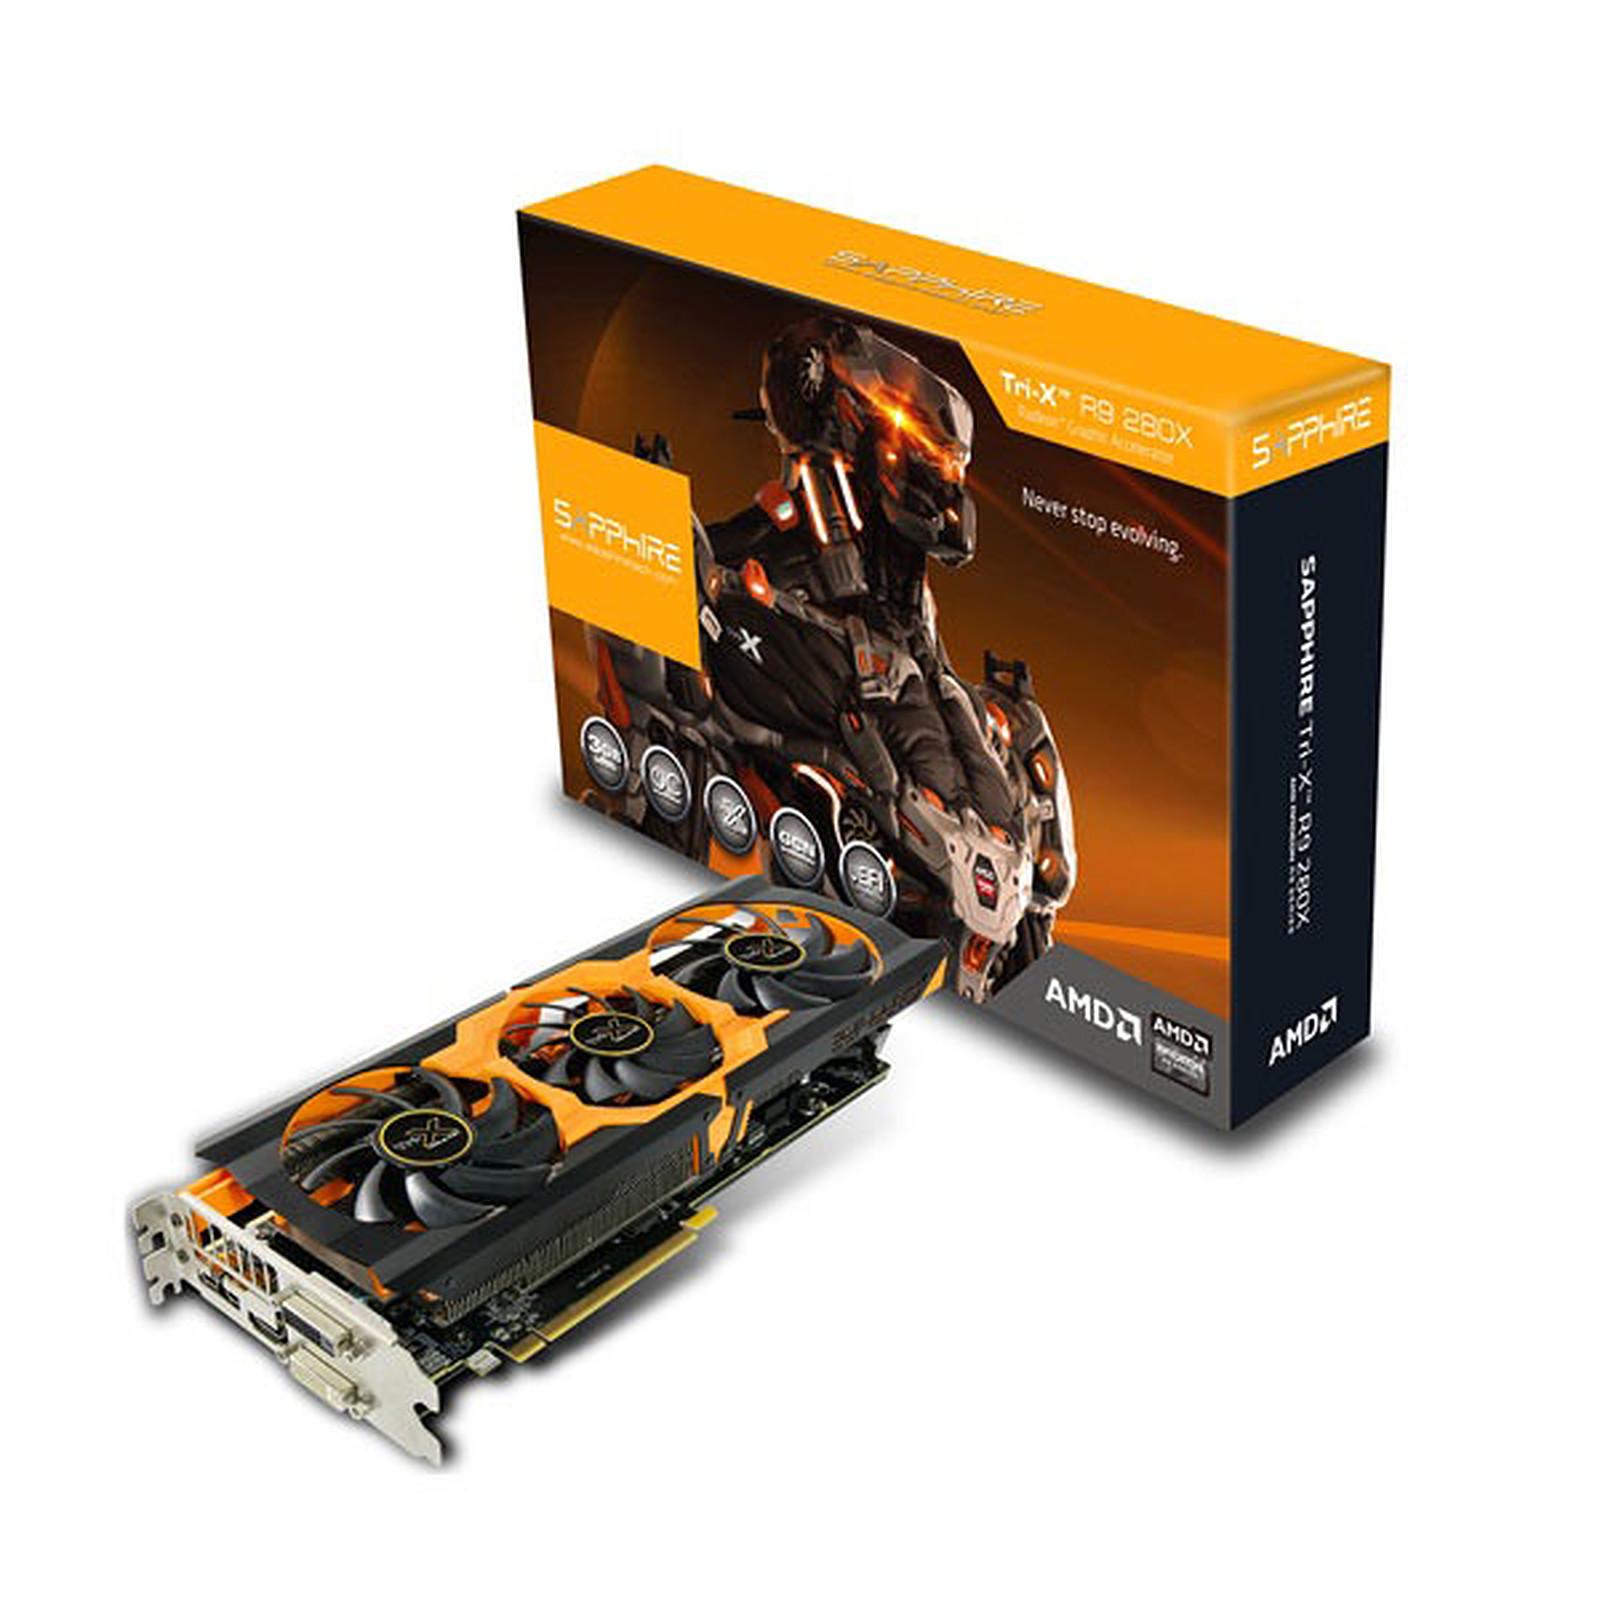 Sapphire Radeon R9 280X Tri-X 3G GDDR5 EUFI OC Version